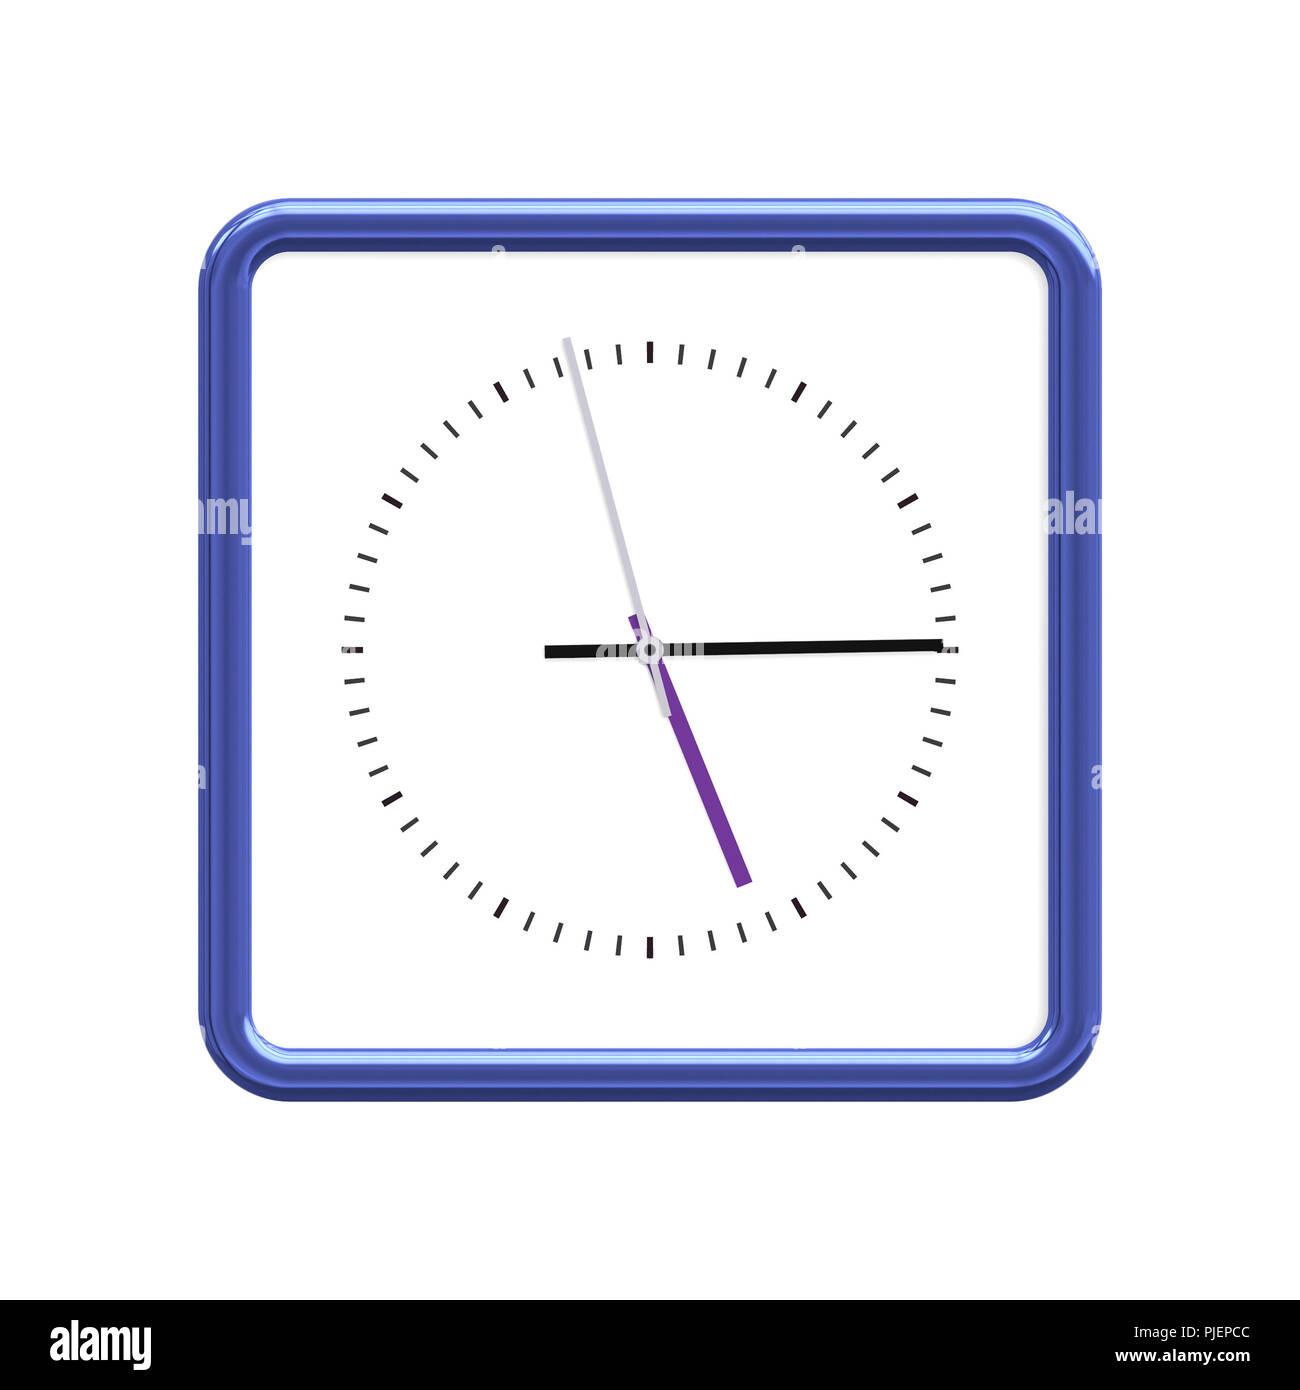 An image of a nice blue clock - Stock Image